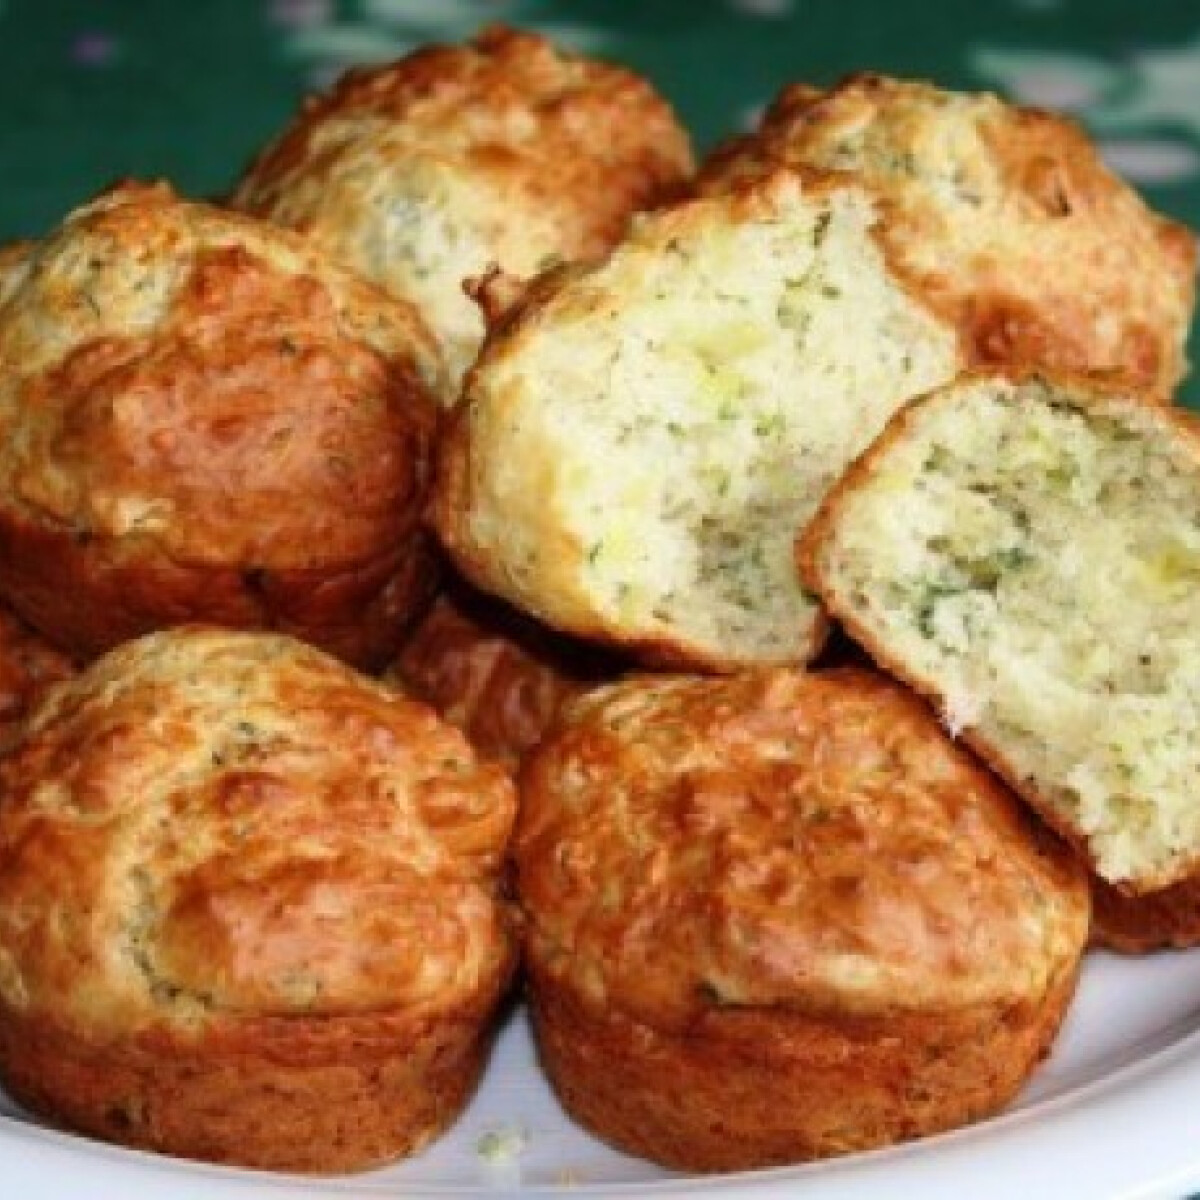 Sajtos-hagymás-petrezselymes muffin